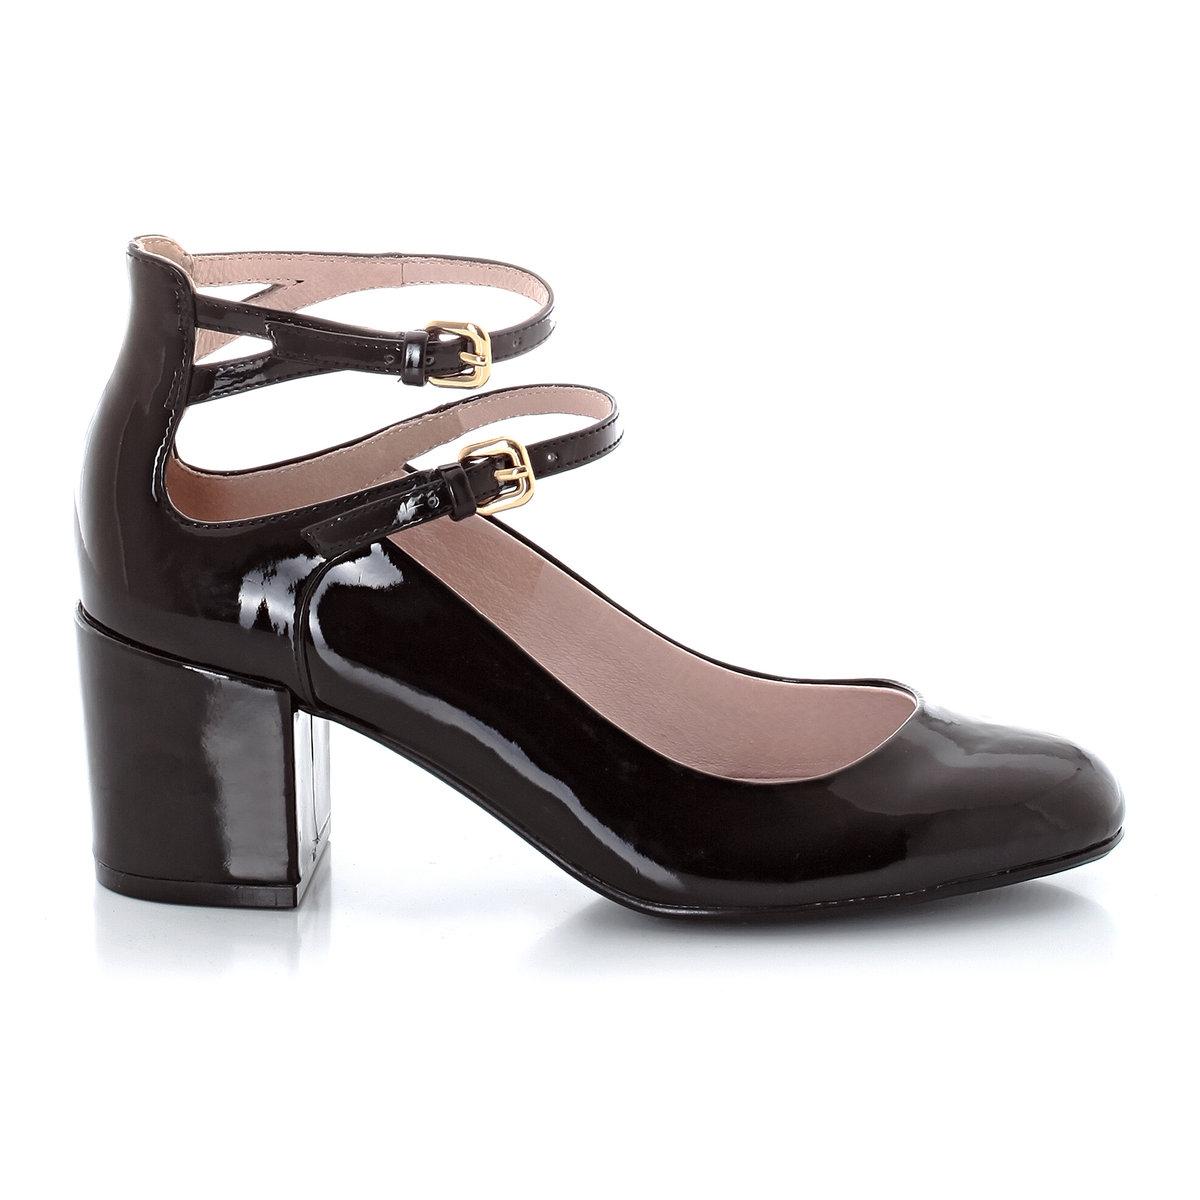 Балетки лакированные на каблуке от MADEMOISELLE R